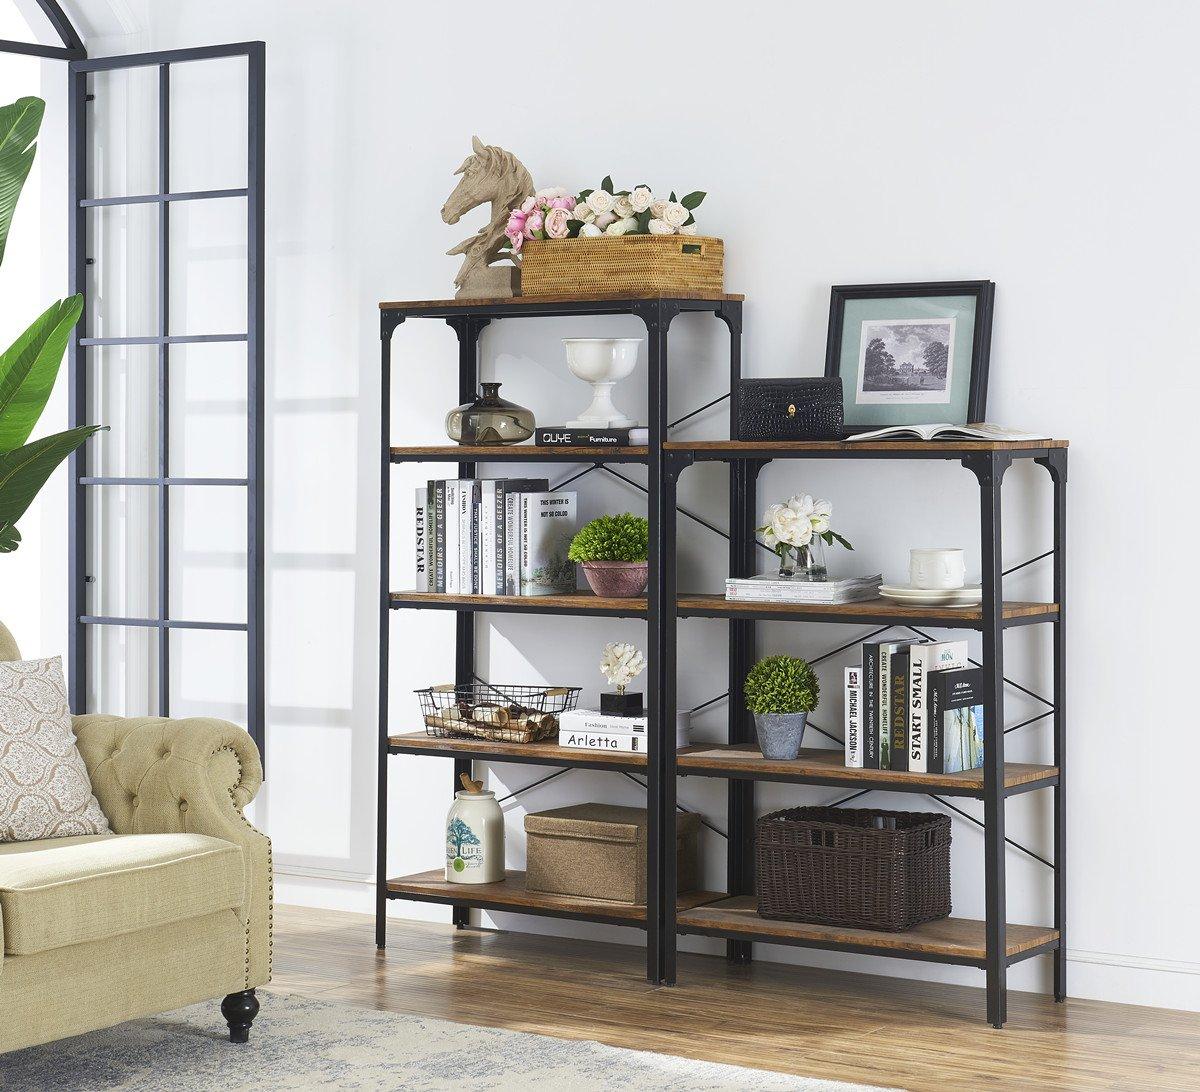 "O&K Furniture 4-Shelf Industrial Vintage Bookcase, Metal Bookshelf, 48""H x 33""W x 13""D, Barn-Wood Finish by O&K Furniture (Image #2)"